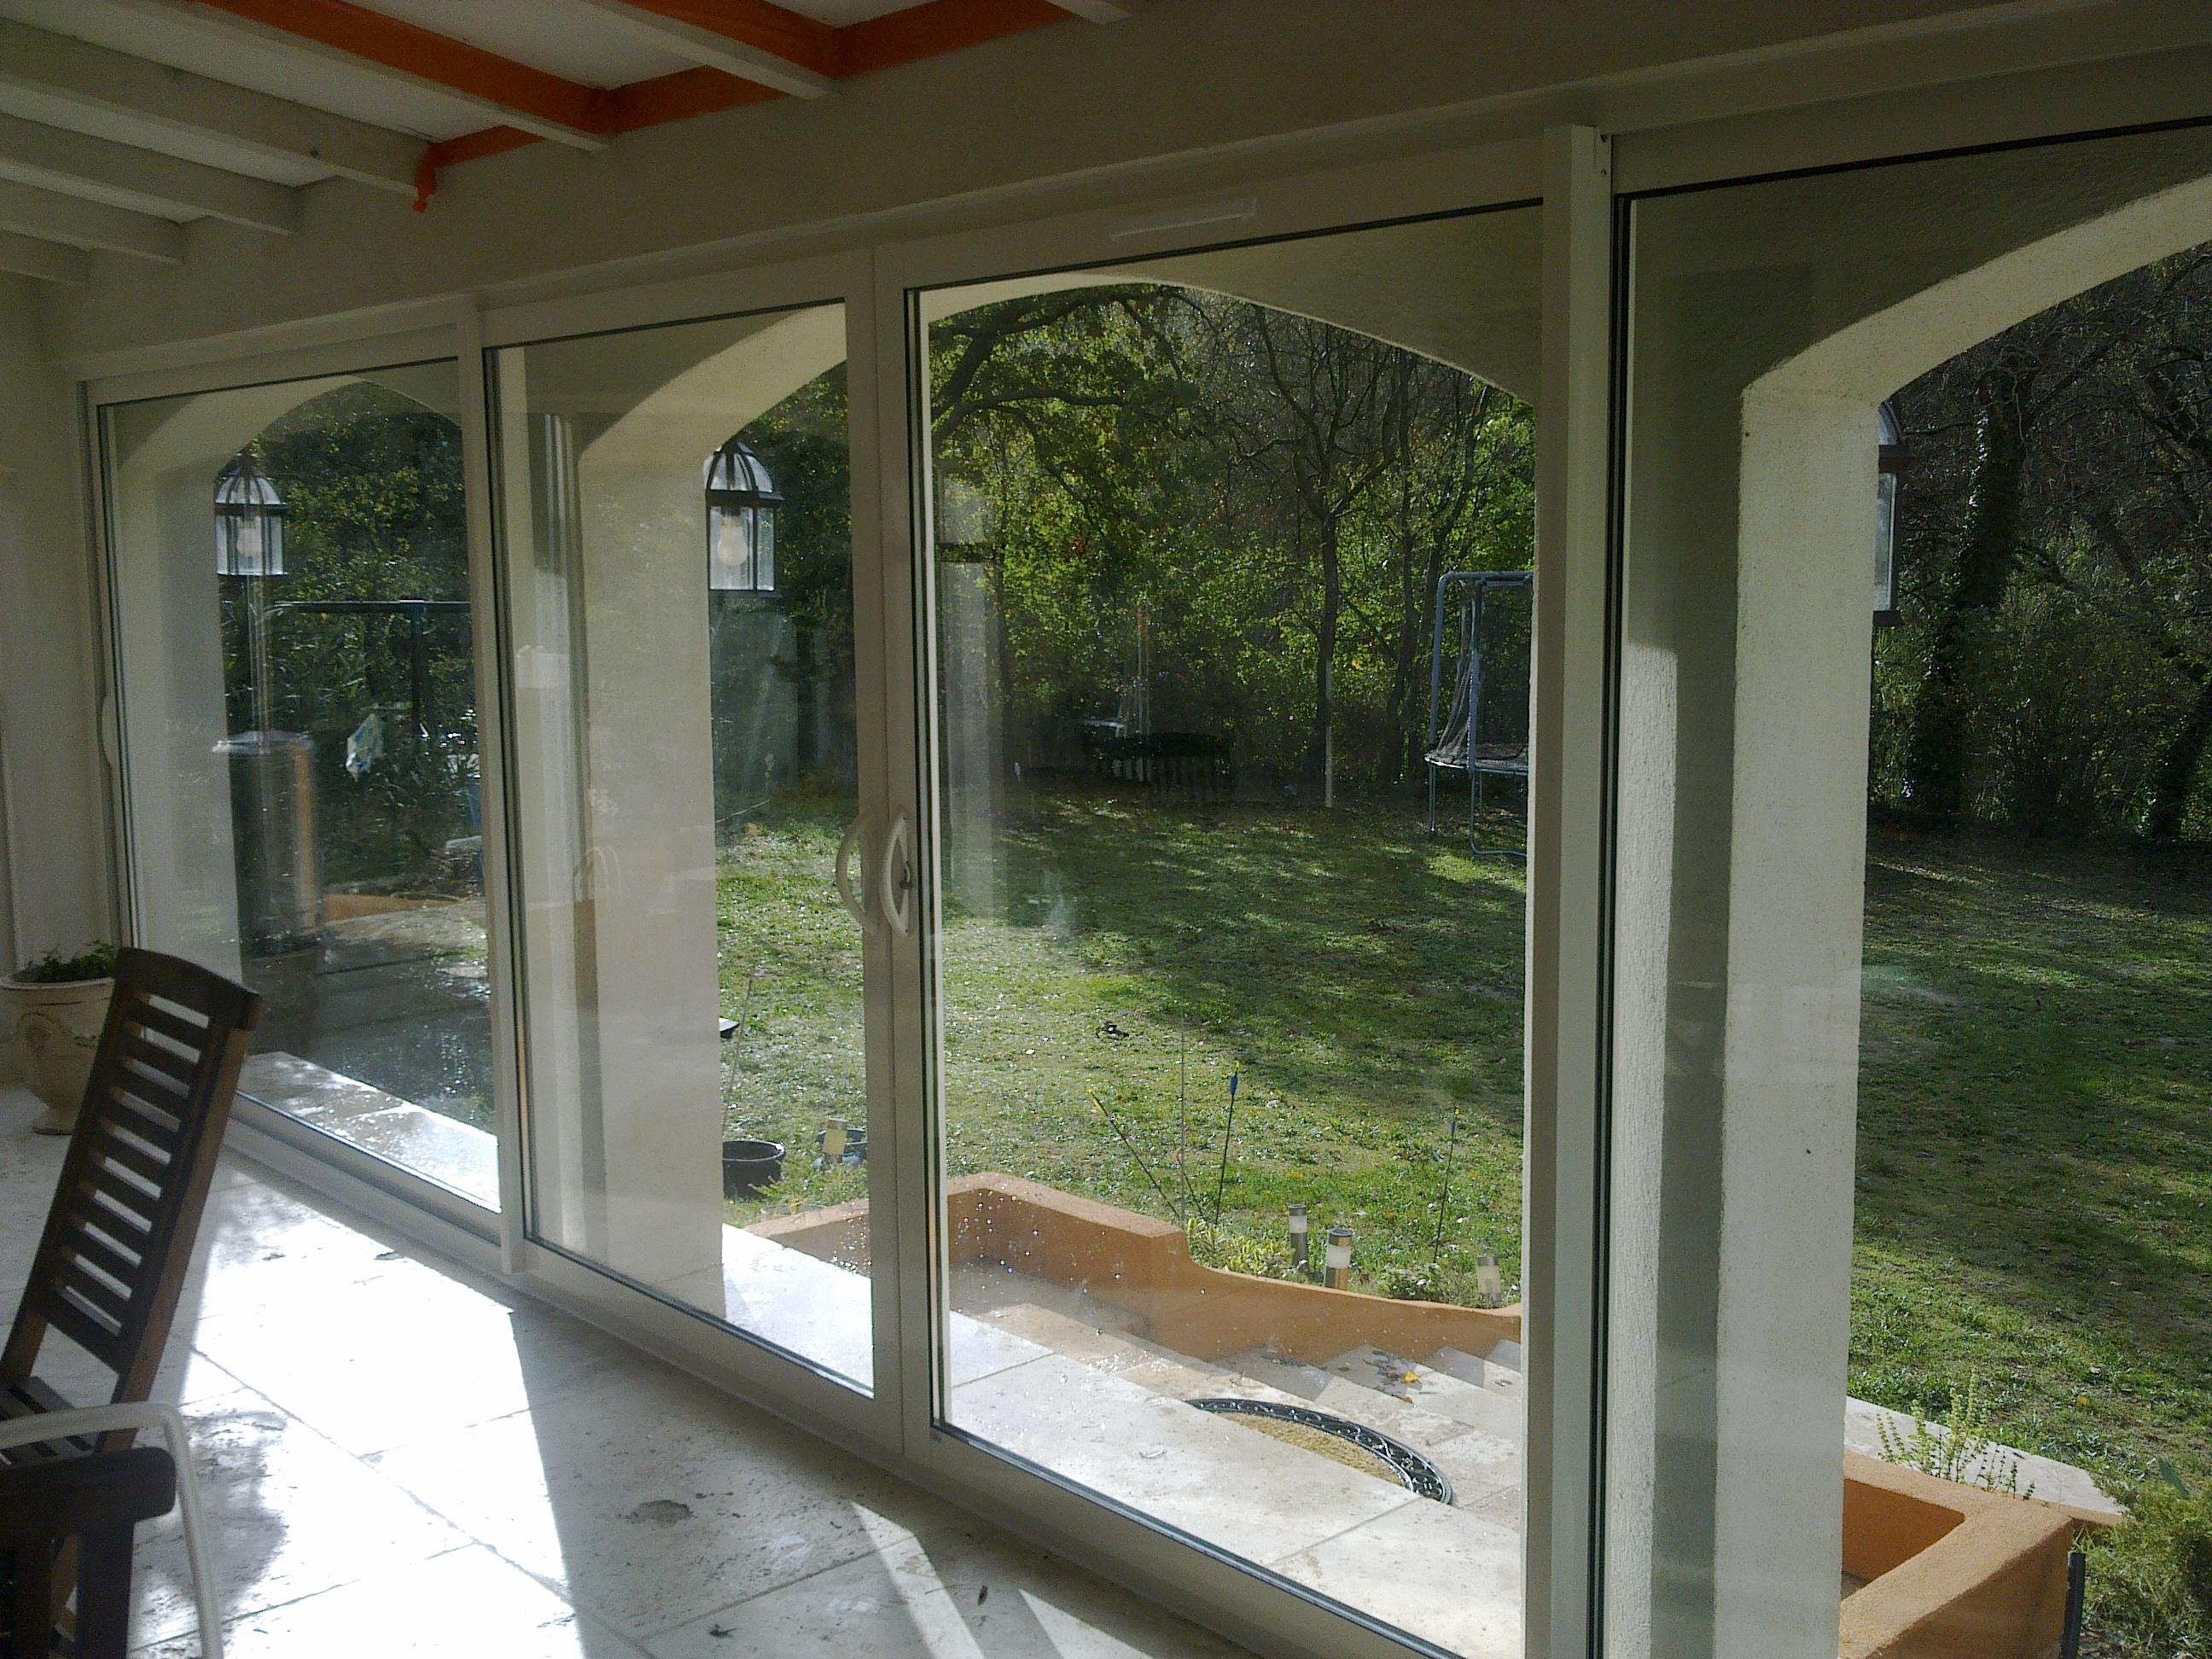 idee pour fermer une terrasse couverte ides pour votre terrasse couverte les ralisations. Black Bedroom Furniture Sets. Home Design Ideas